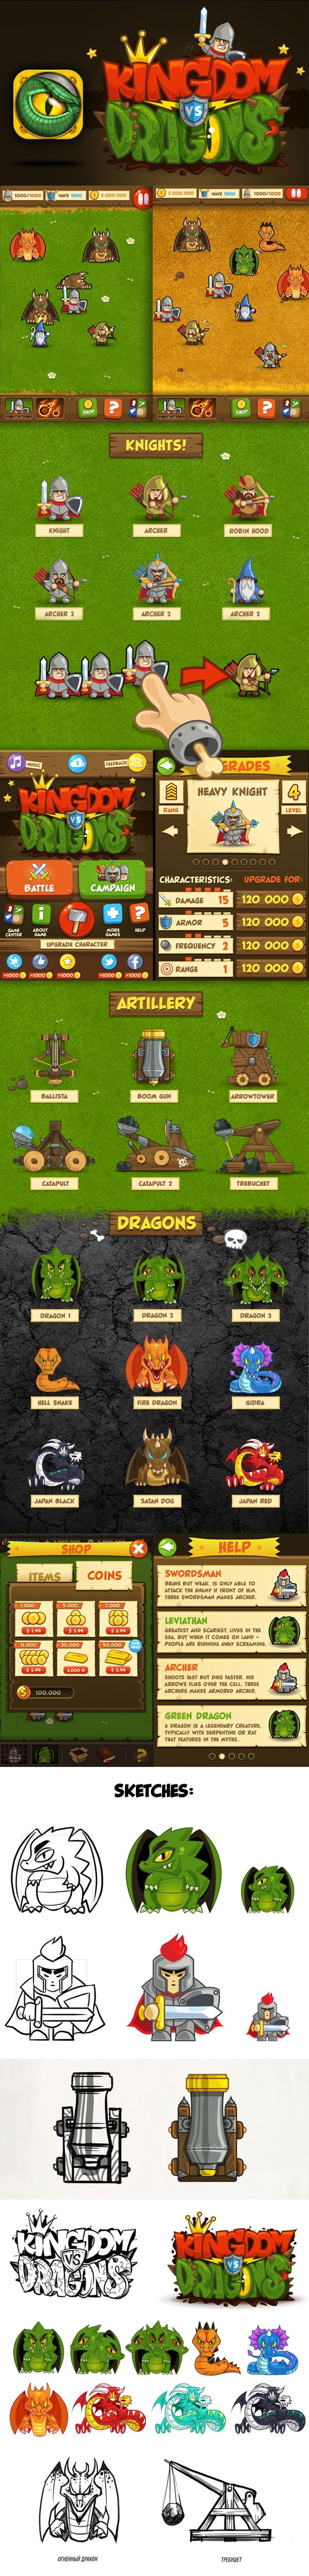 1108 best game ui images on pinterest game design game